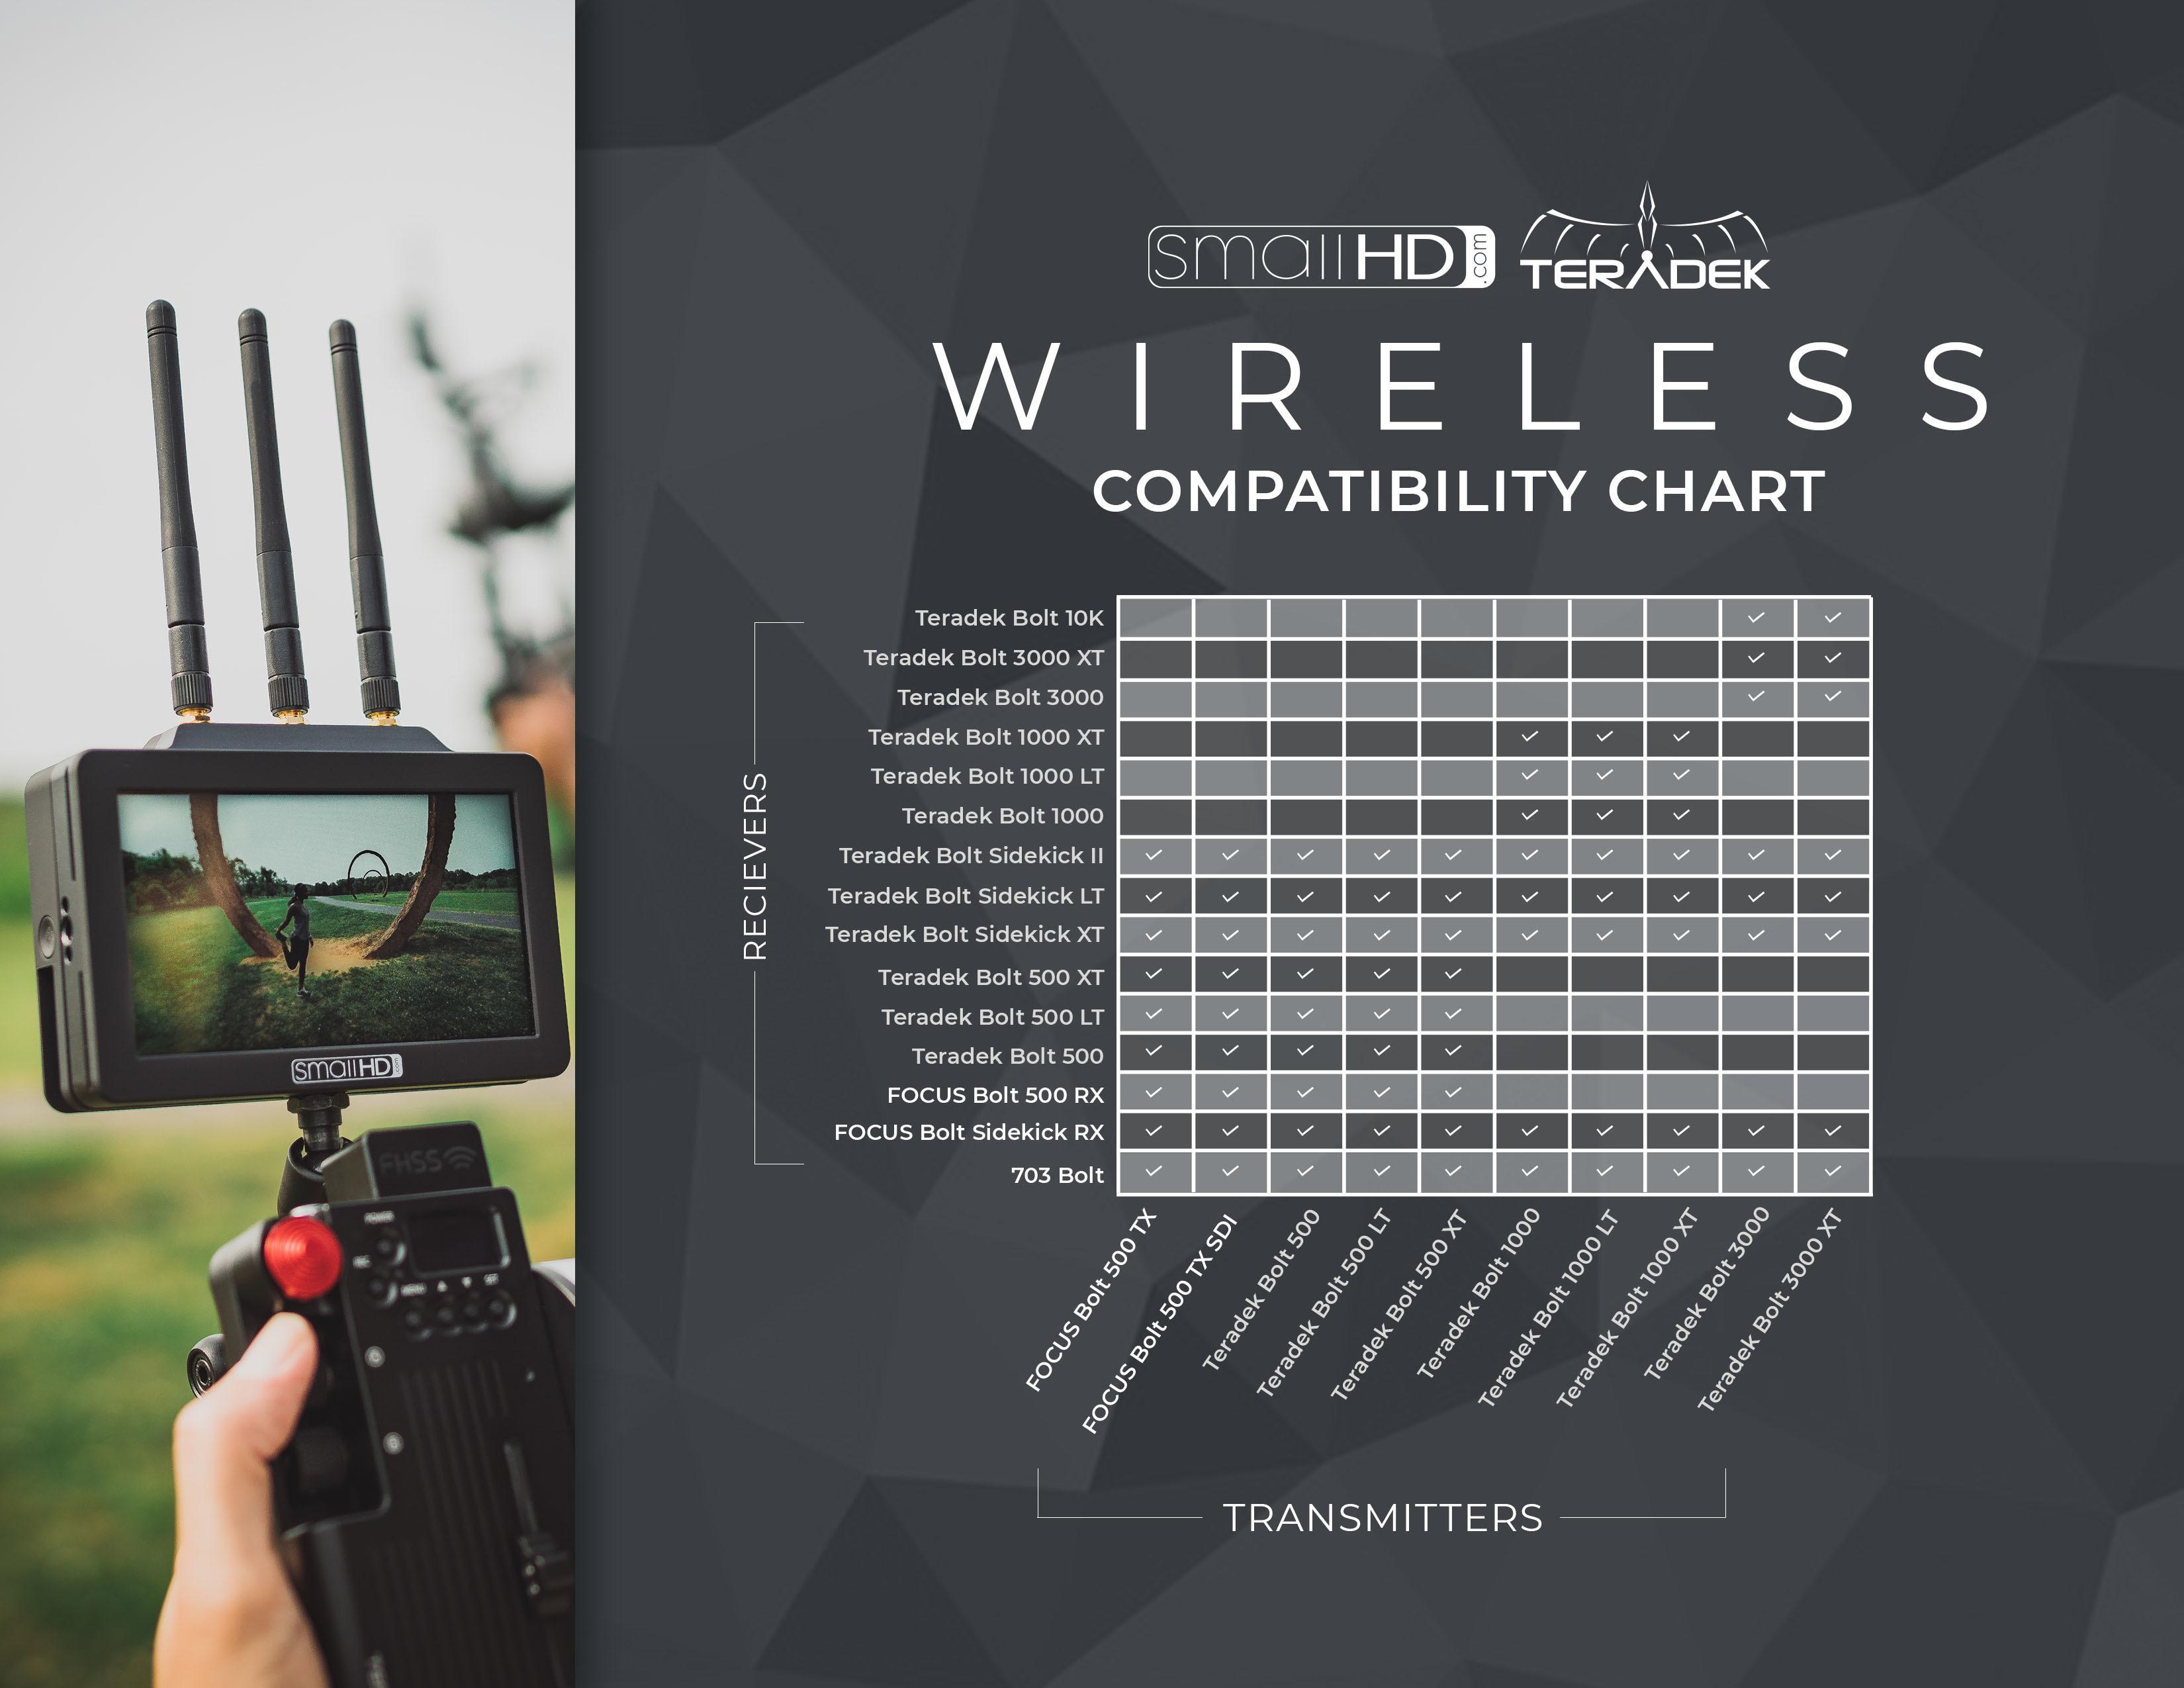 SmallHD - Teradek Wireless Compatibility Chart